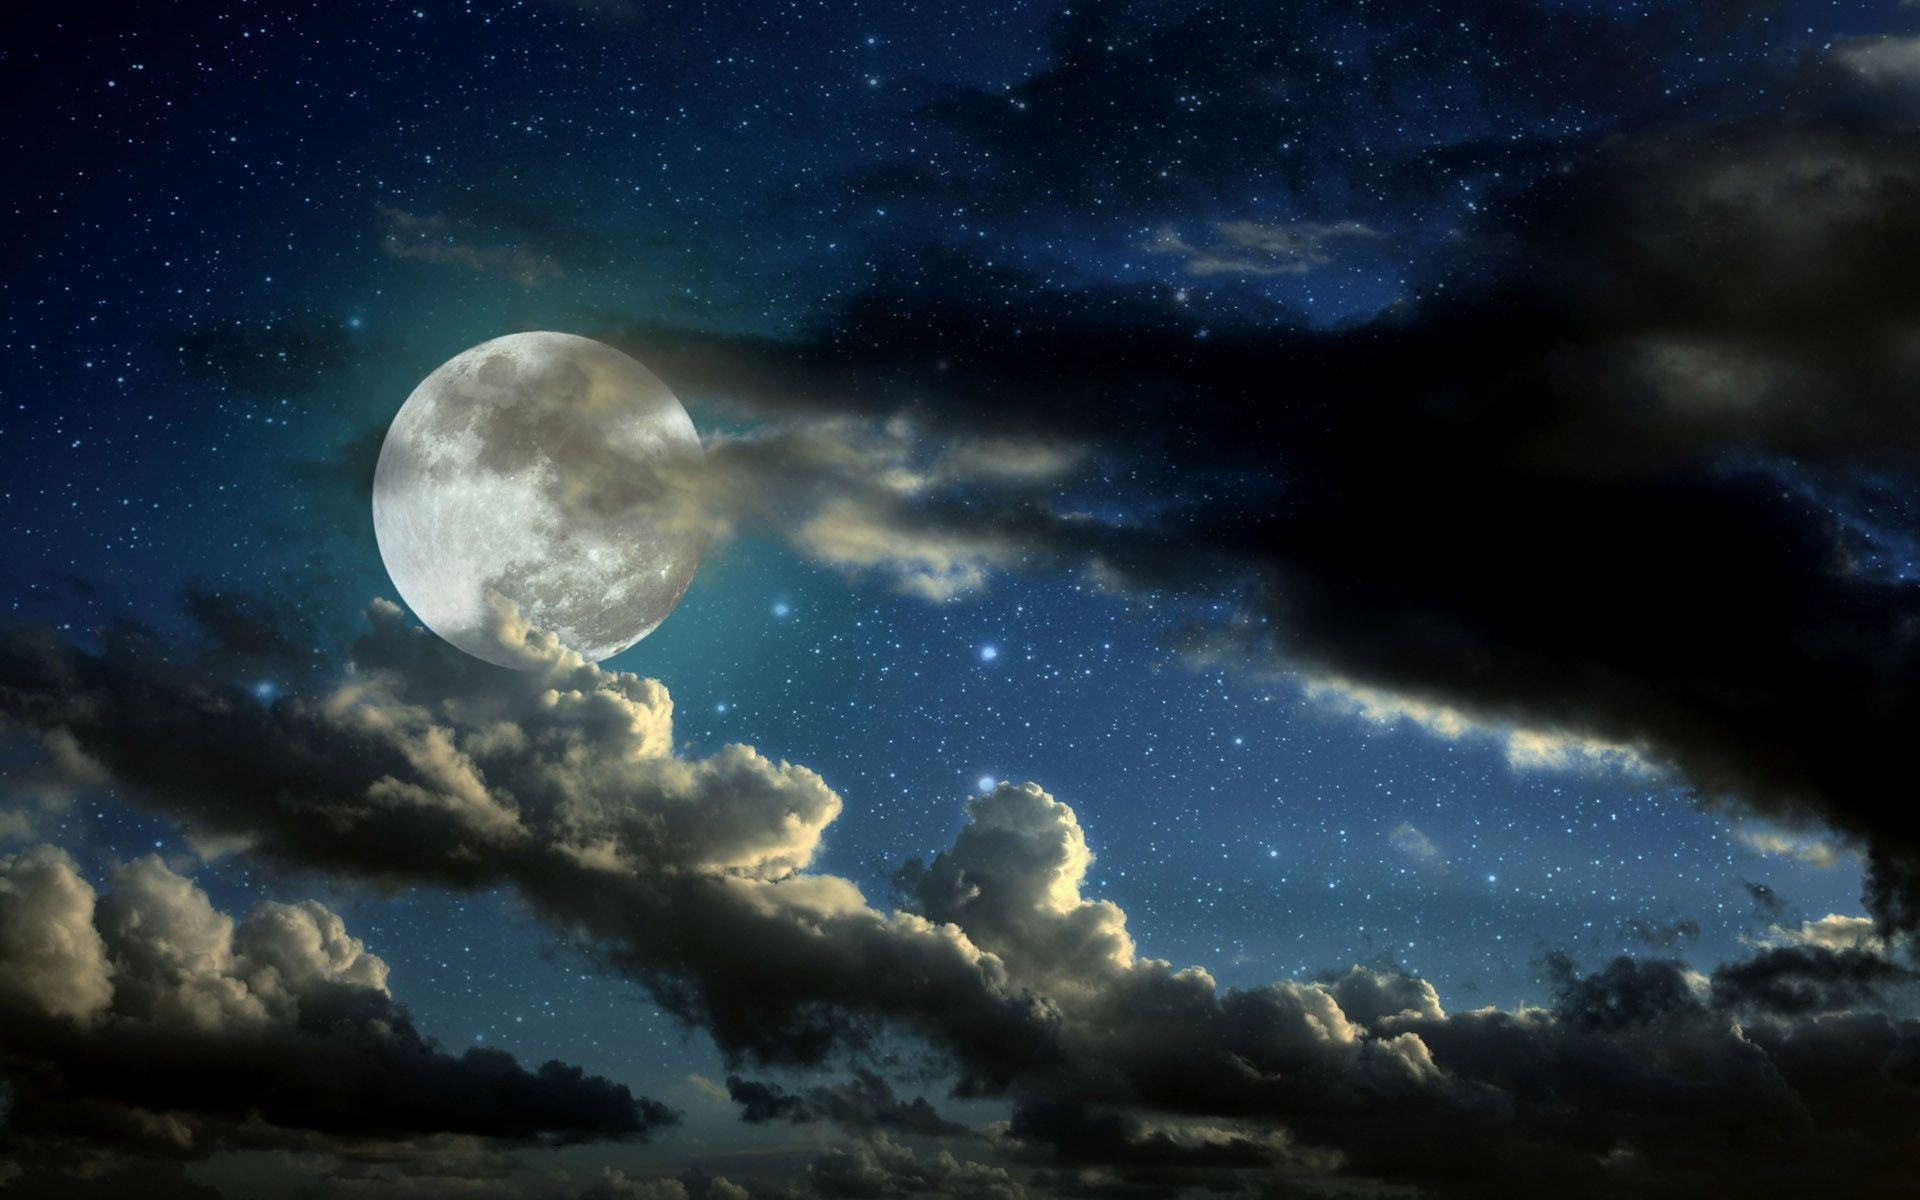 wallpaper.wiki-Desktop-Night-Sky-HD-Wallpapers-Download-PIC-WPE0010451